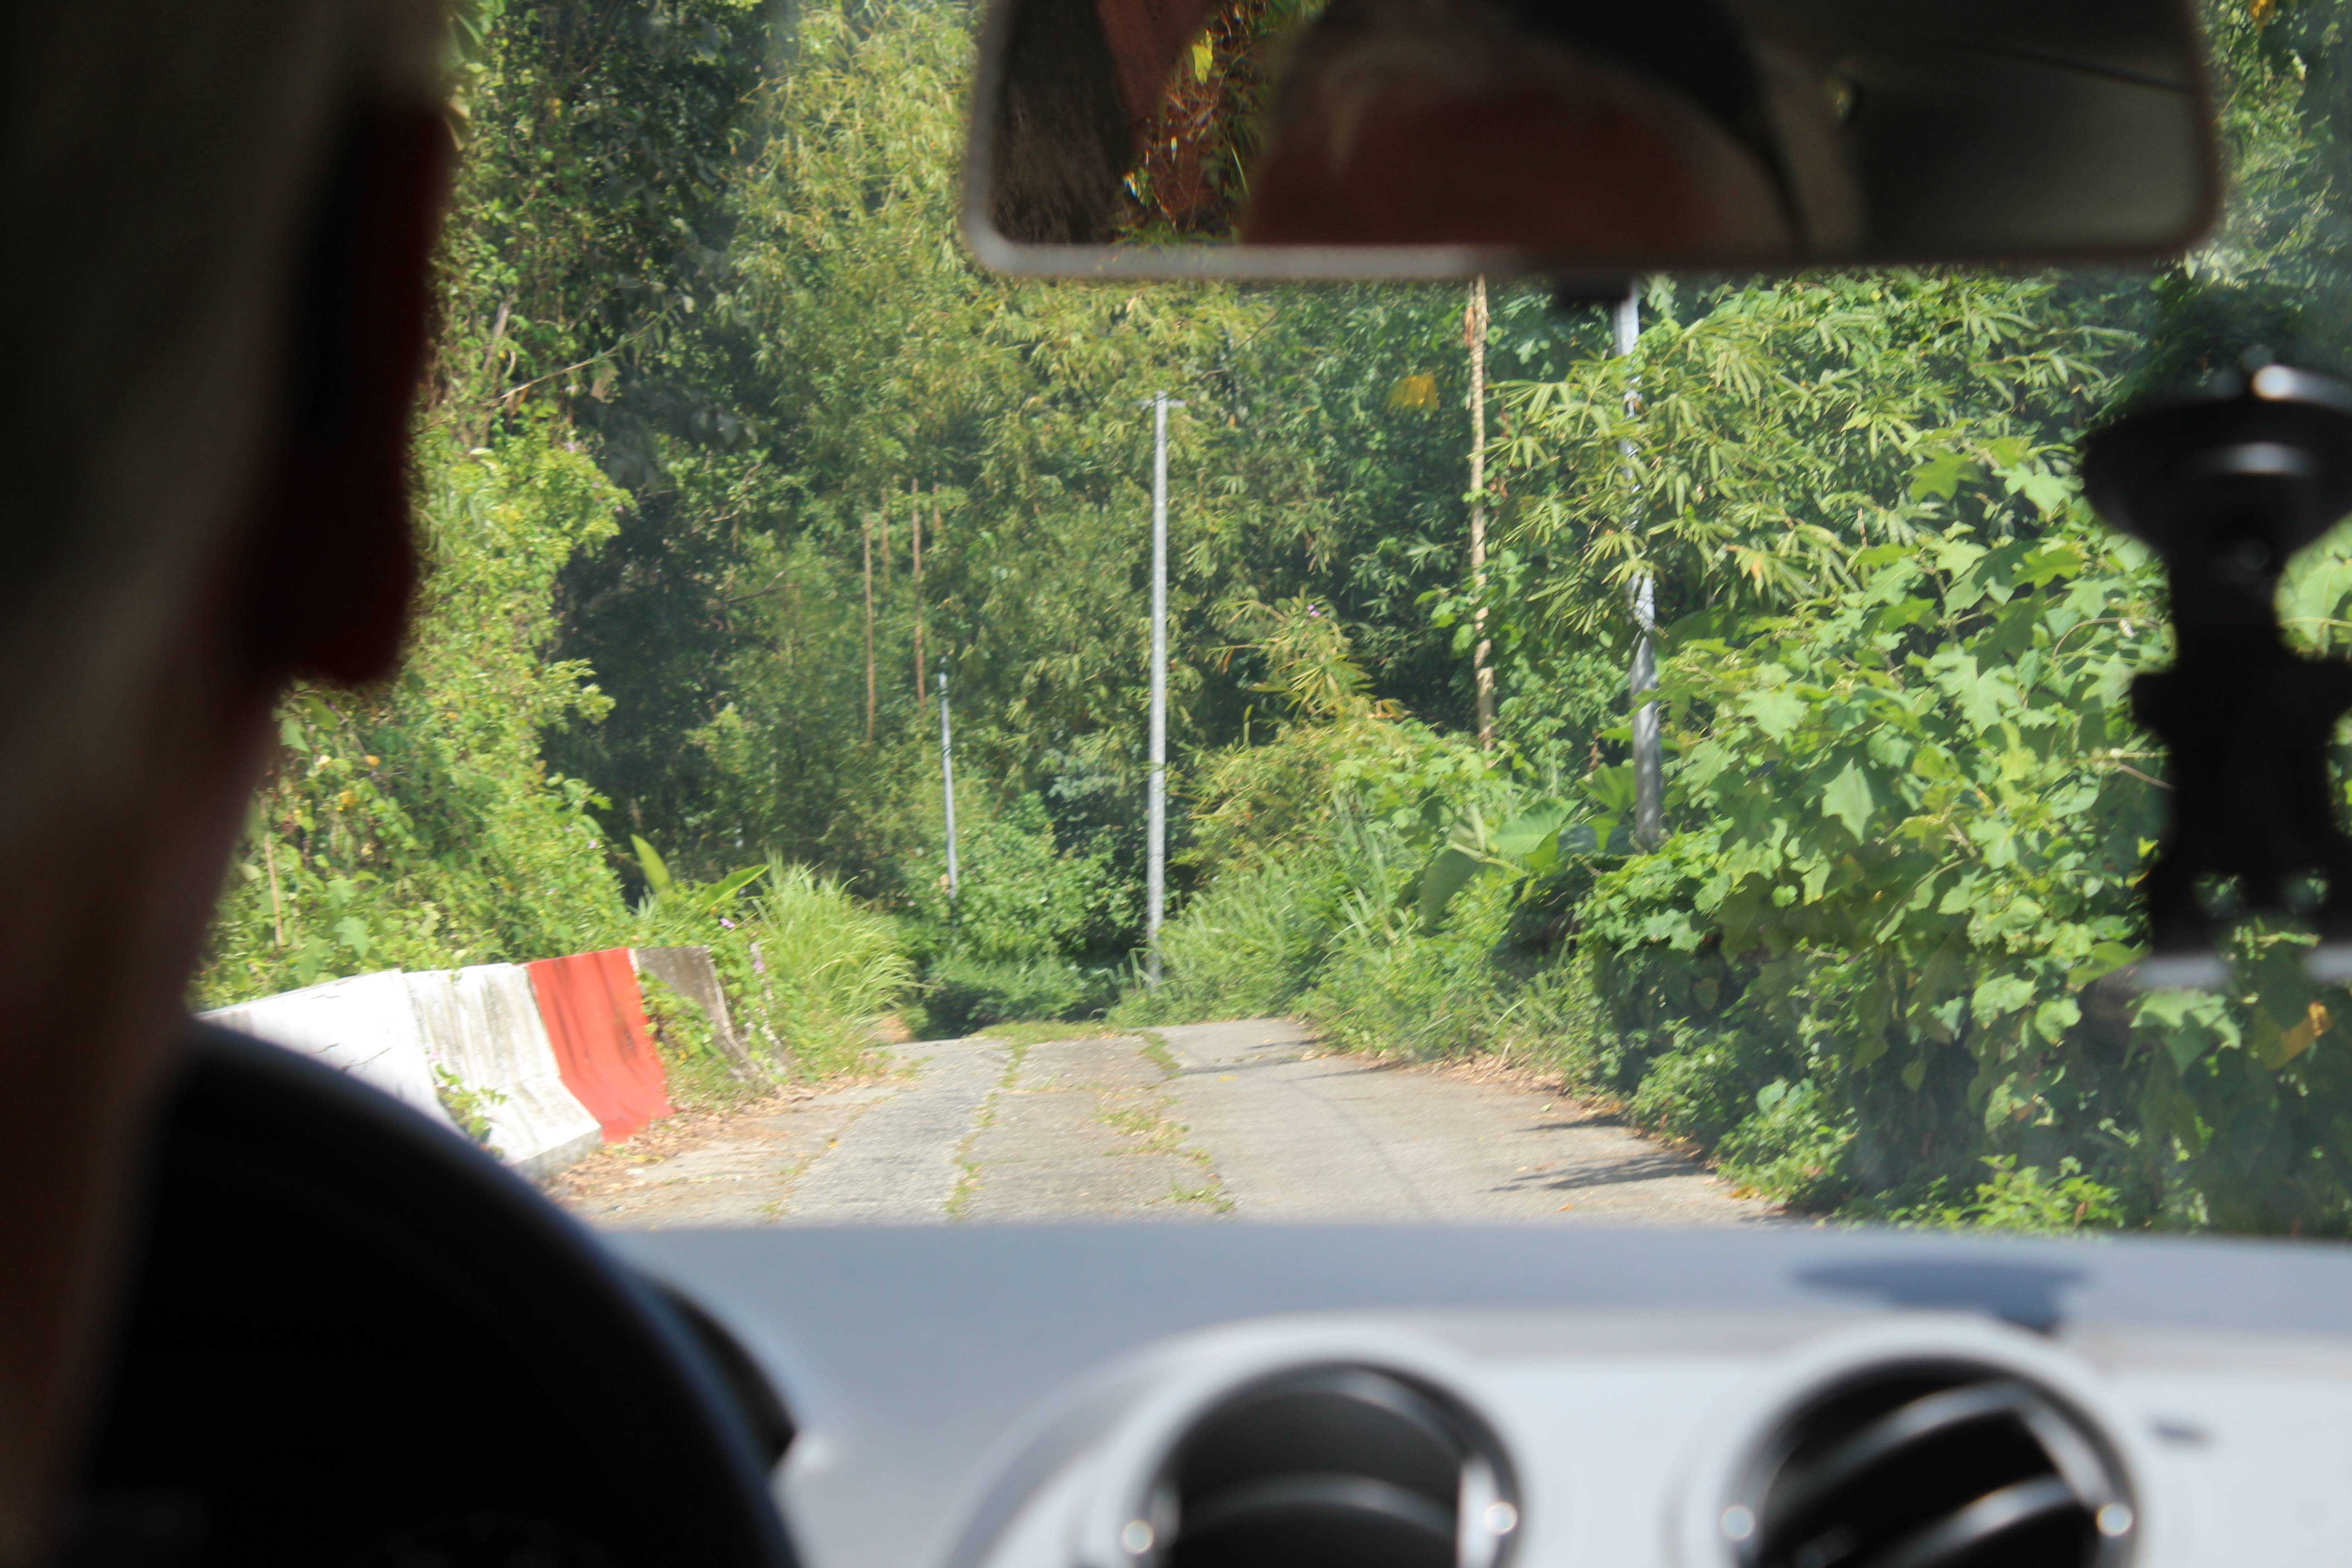 Photo 3: Martinique cascade couleuvre